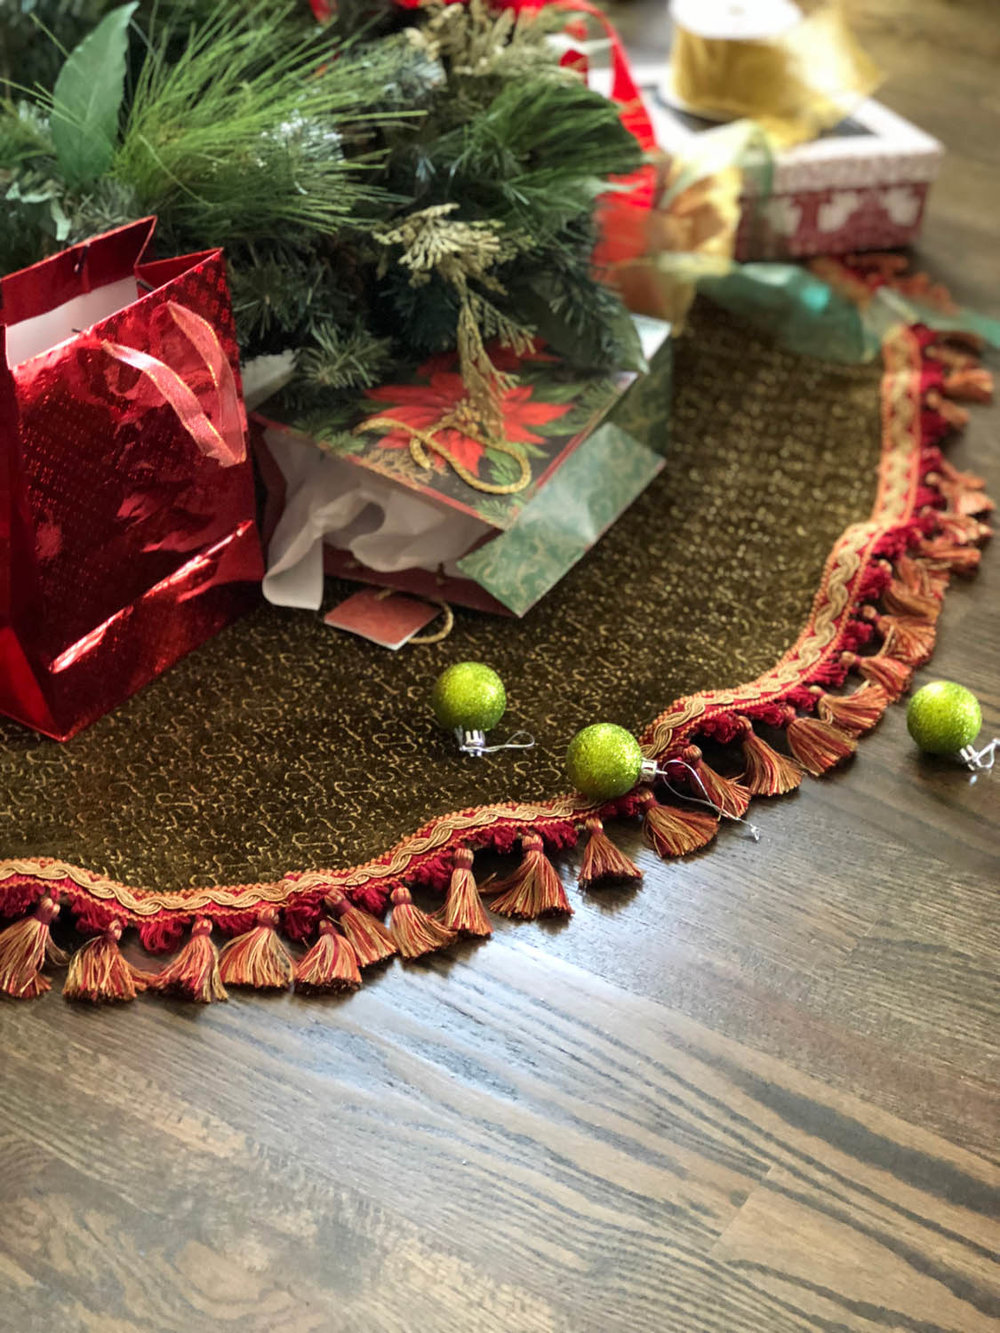 Elegant No-Sew Christmas Tree Skirt Using Upholstery Fabric and Fringe